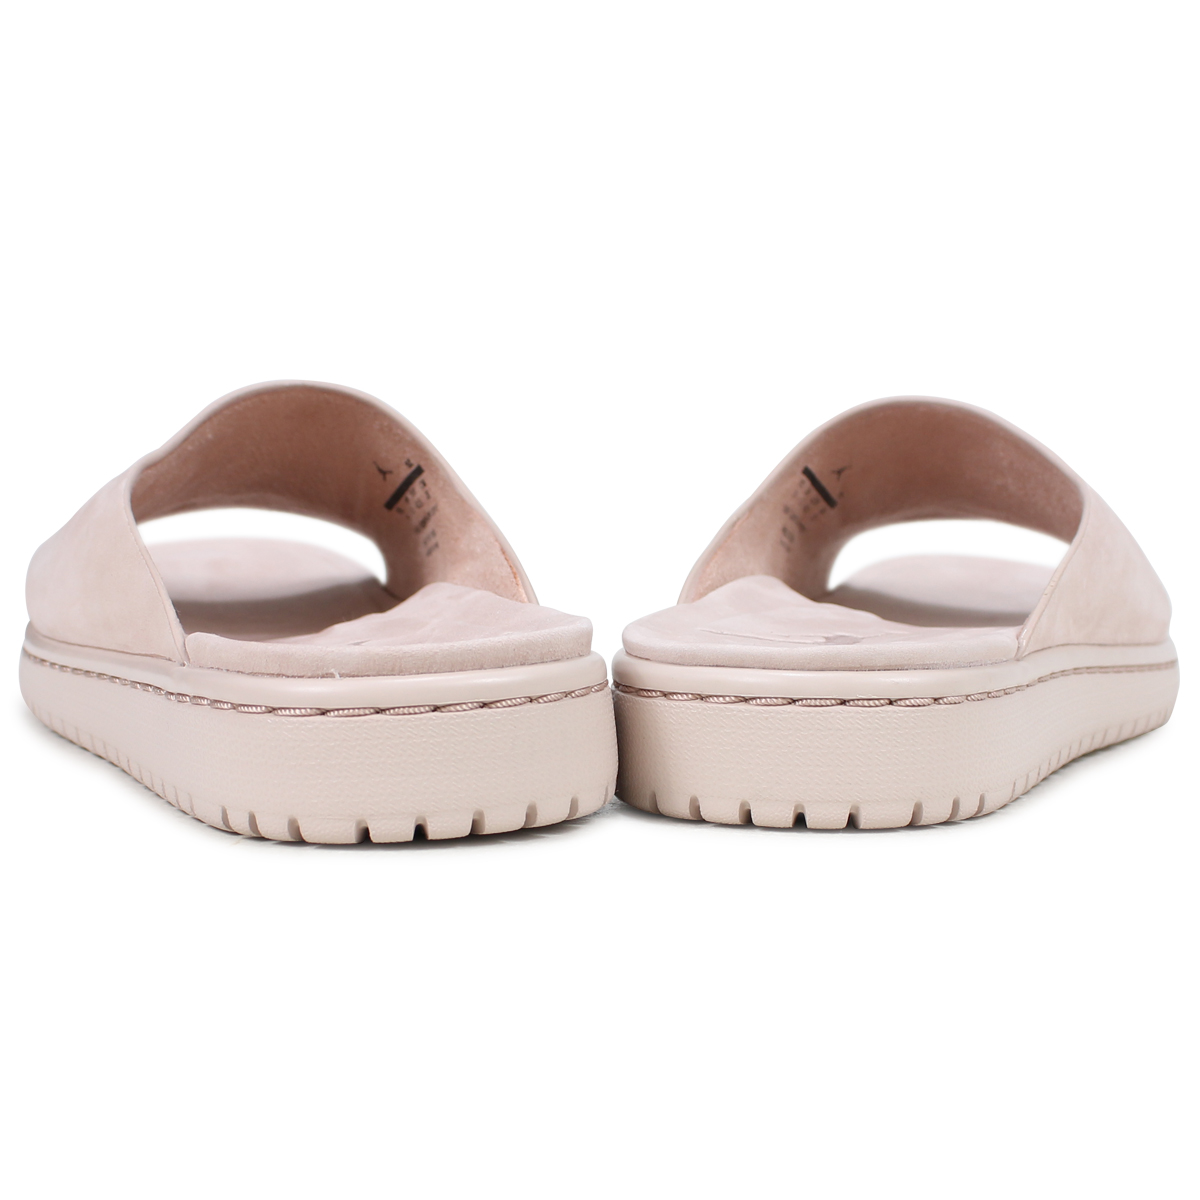 d0c70716dfe1 ... france nike nike sandals jordan shower sandals sports ladys men wmns  jordan modero 1 ao9919 200